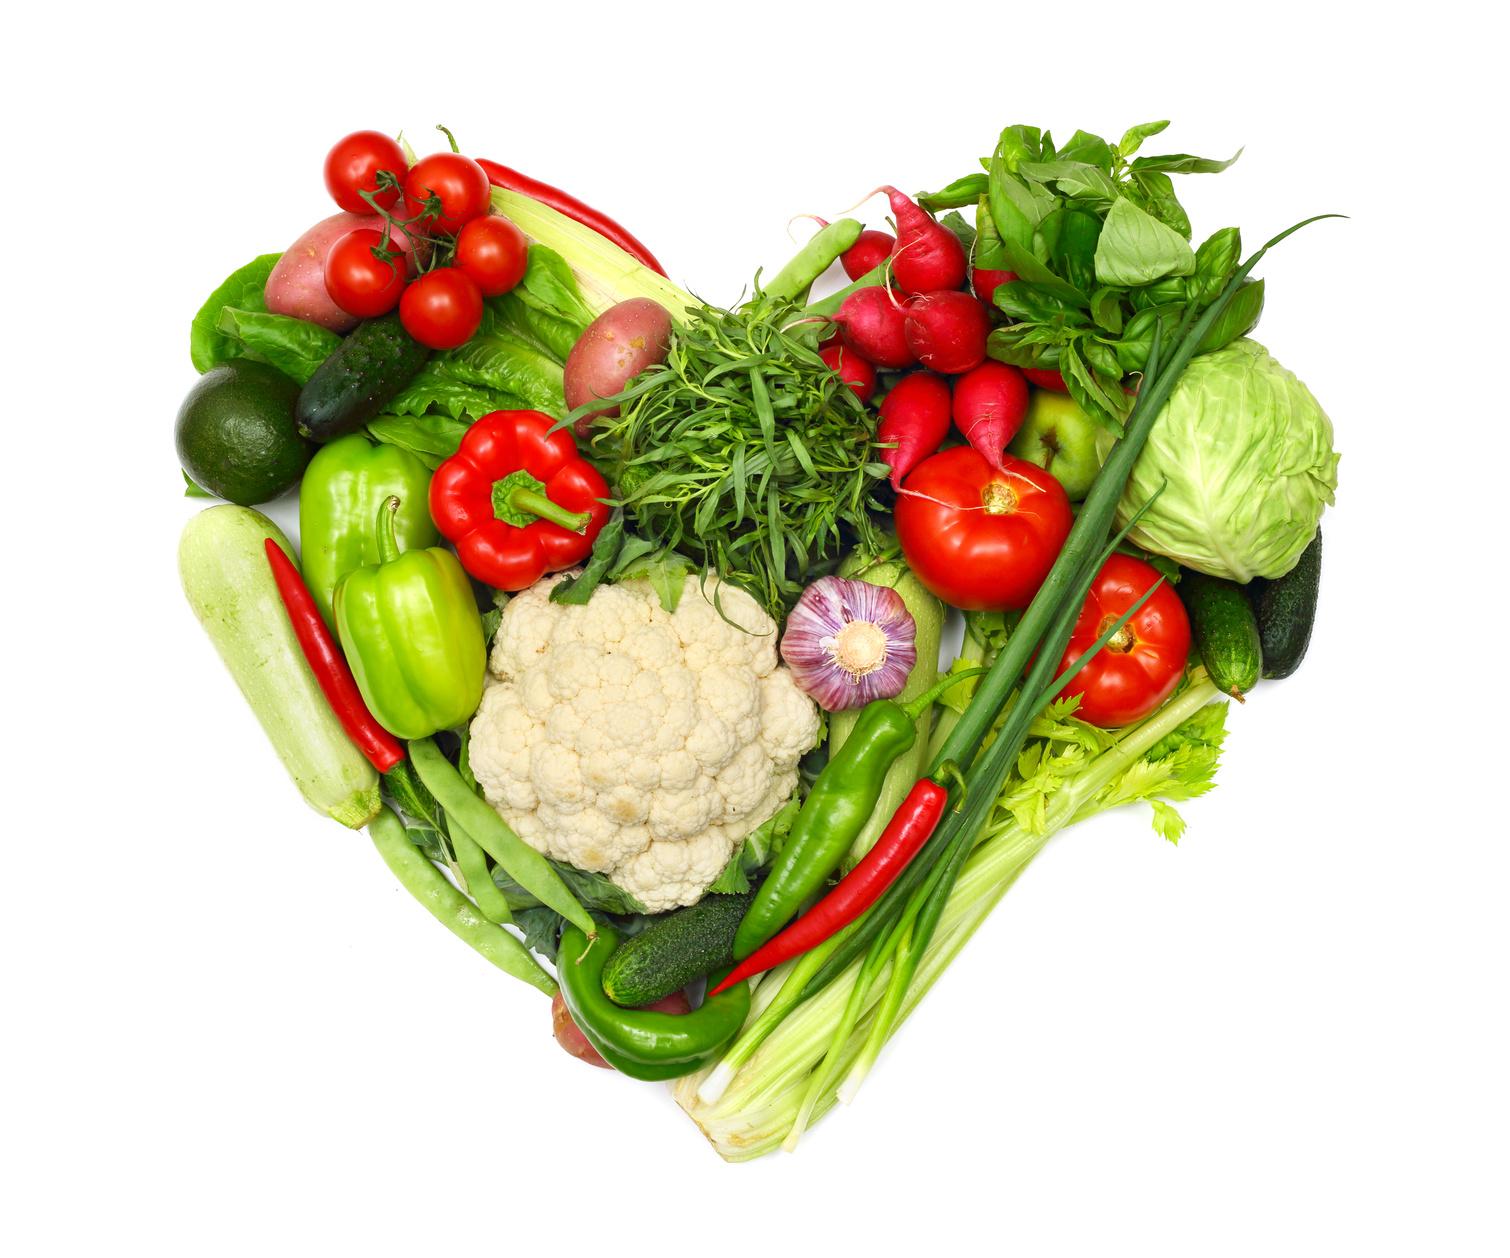 Cuore di verdura